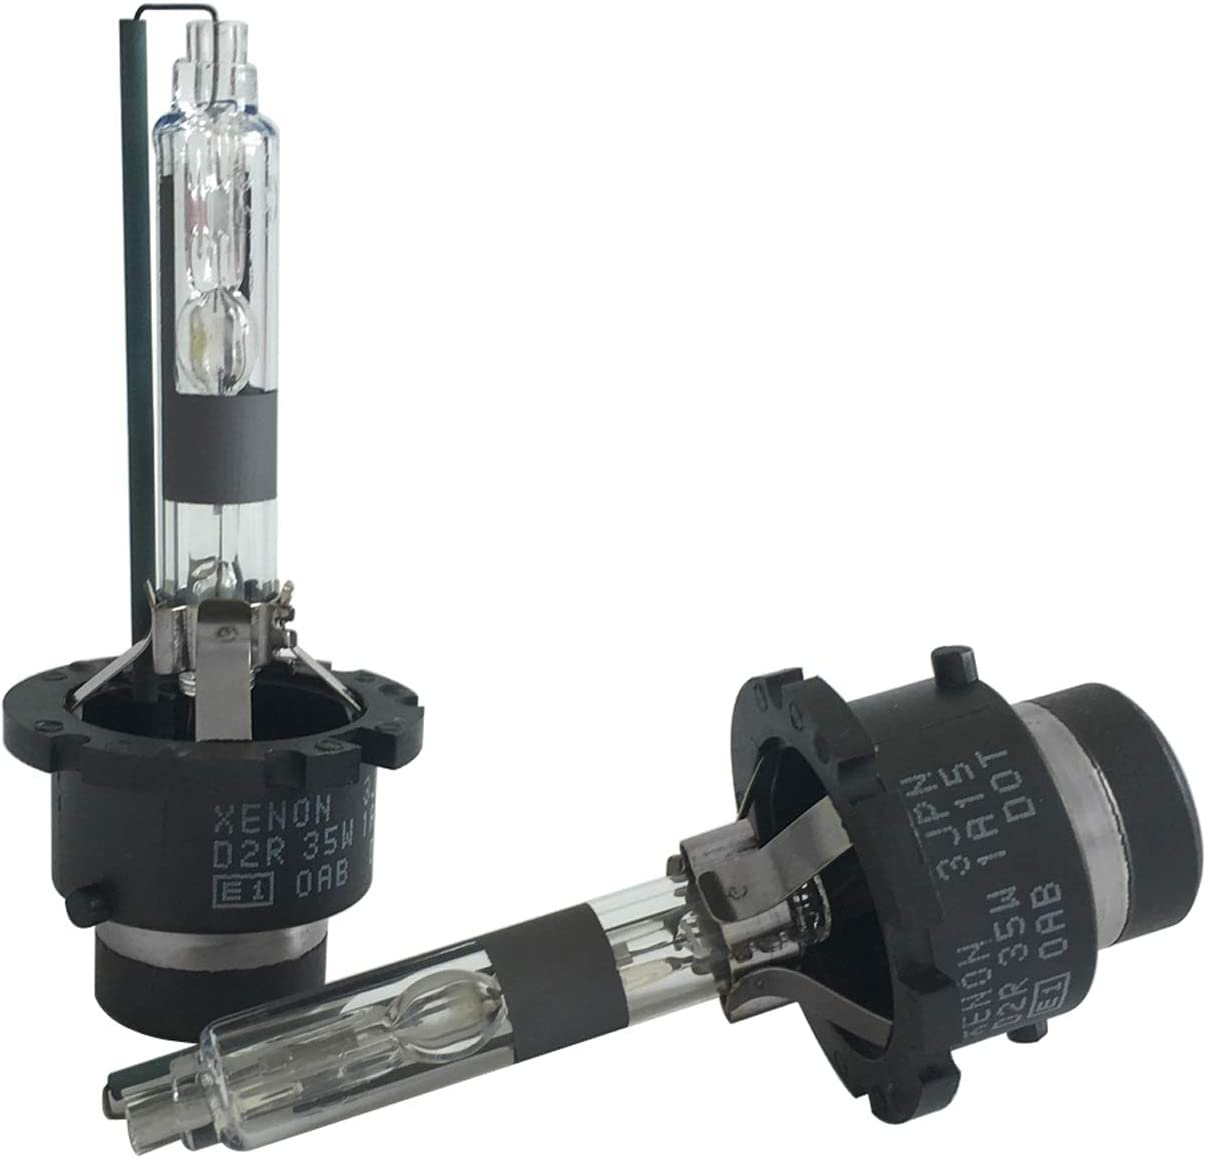 2013 International PROSTAR PLUS-RH Door mount spotlight -Chrome 6 inch 100W Halogen Larson Electronics 1017OJI4LNG Passenger side WITH install kit